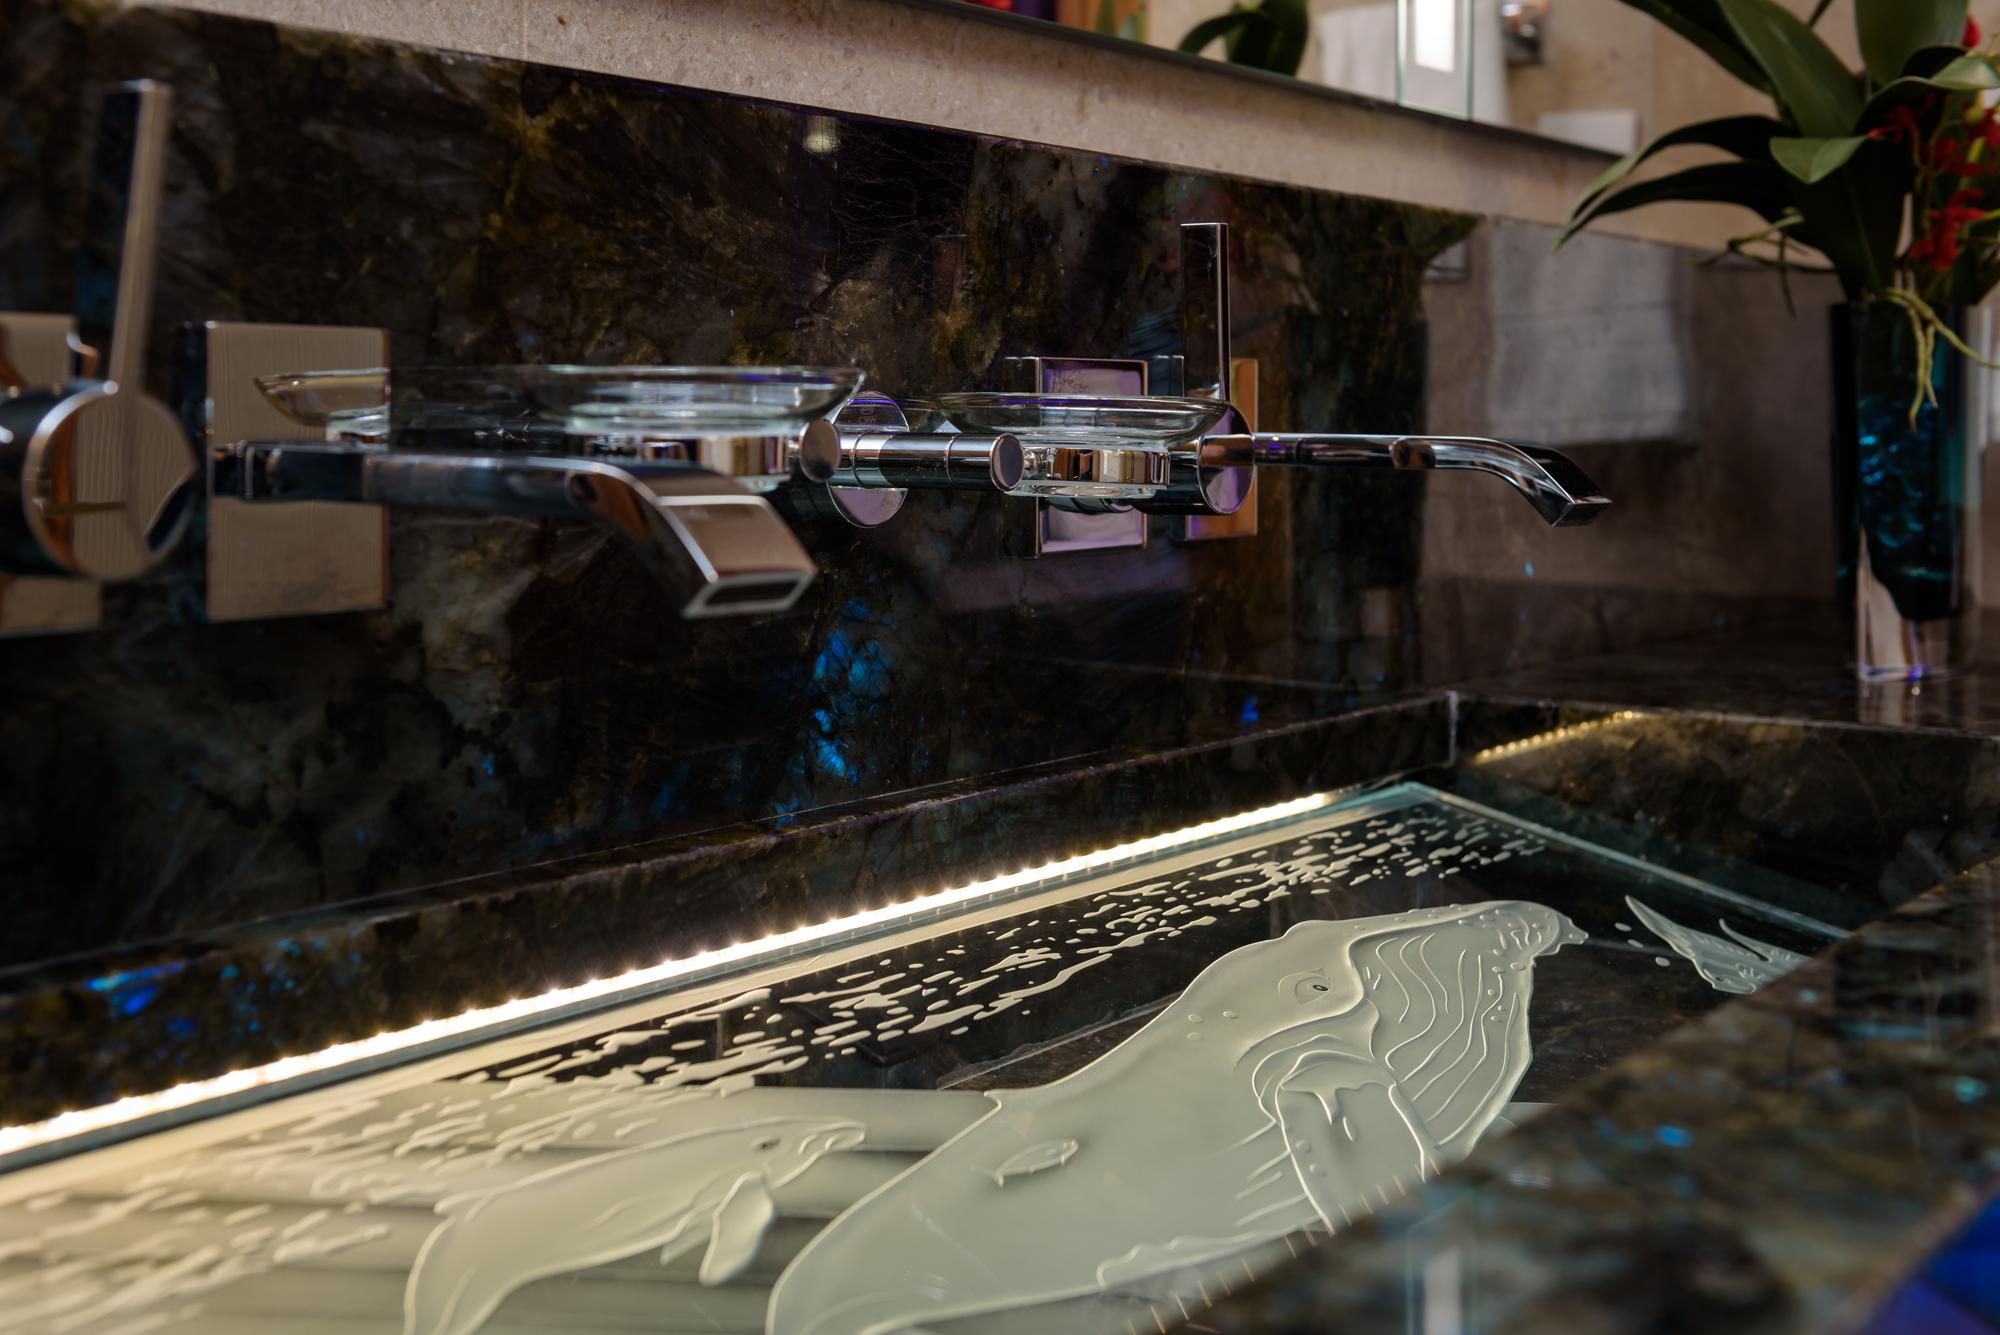 HalePauHanaD1-16AirBnB.jpg